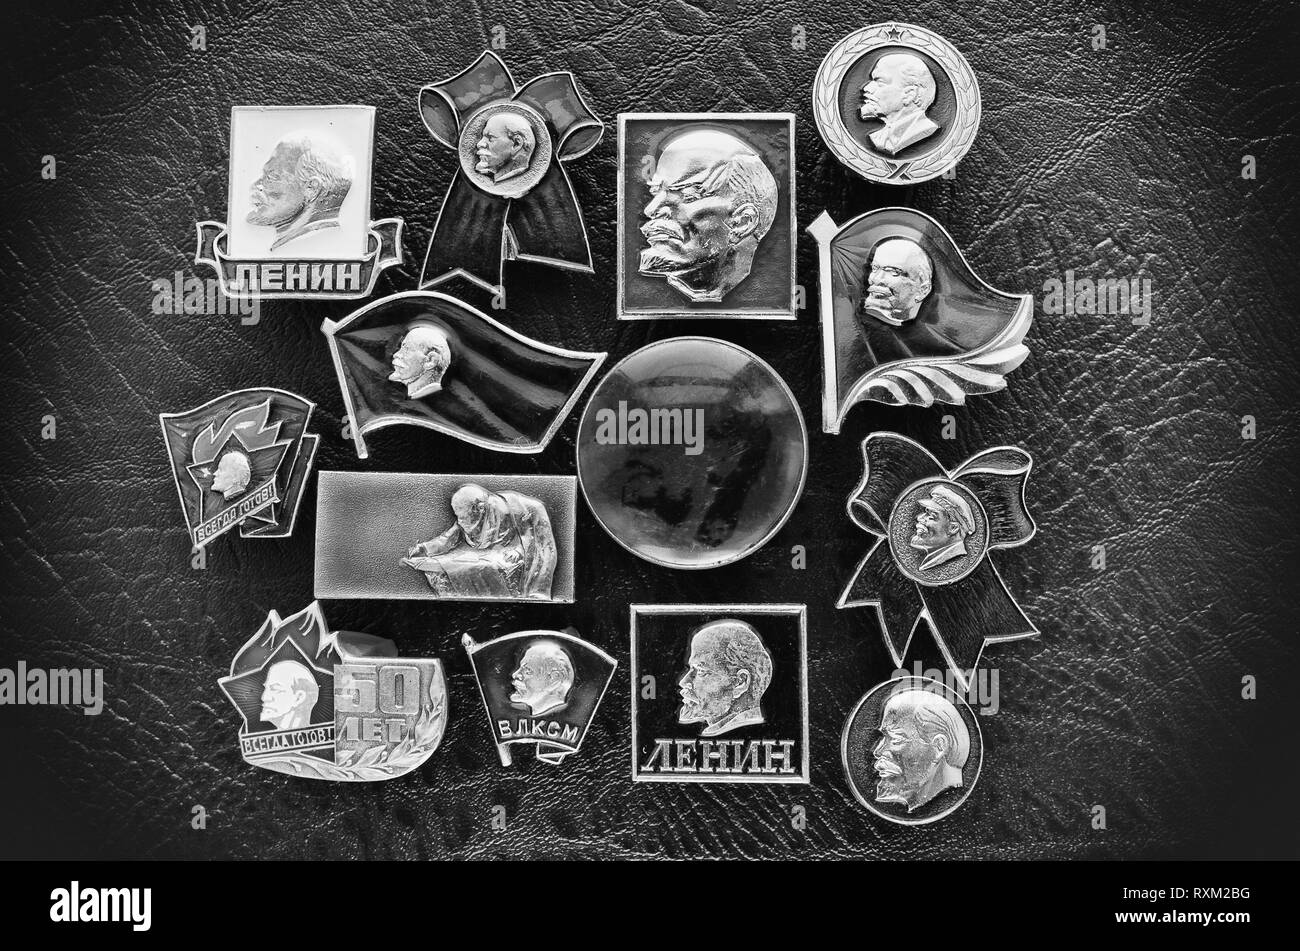 Metal soviet badges with the image of Communist leader Vladimir Lenin in black-white stylization - Stock Image